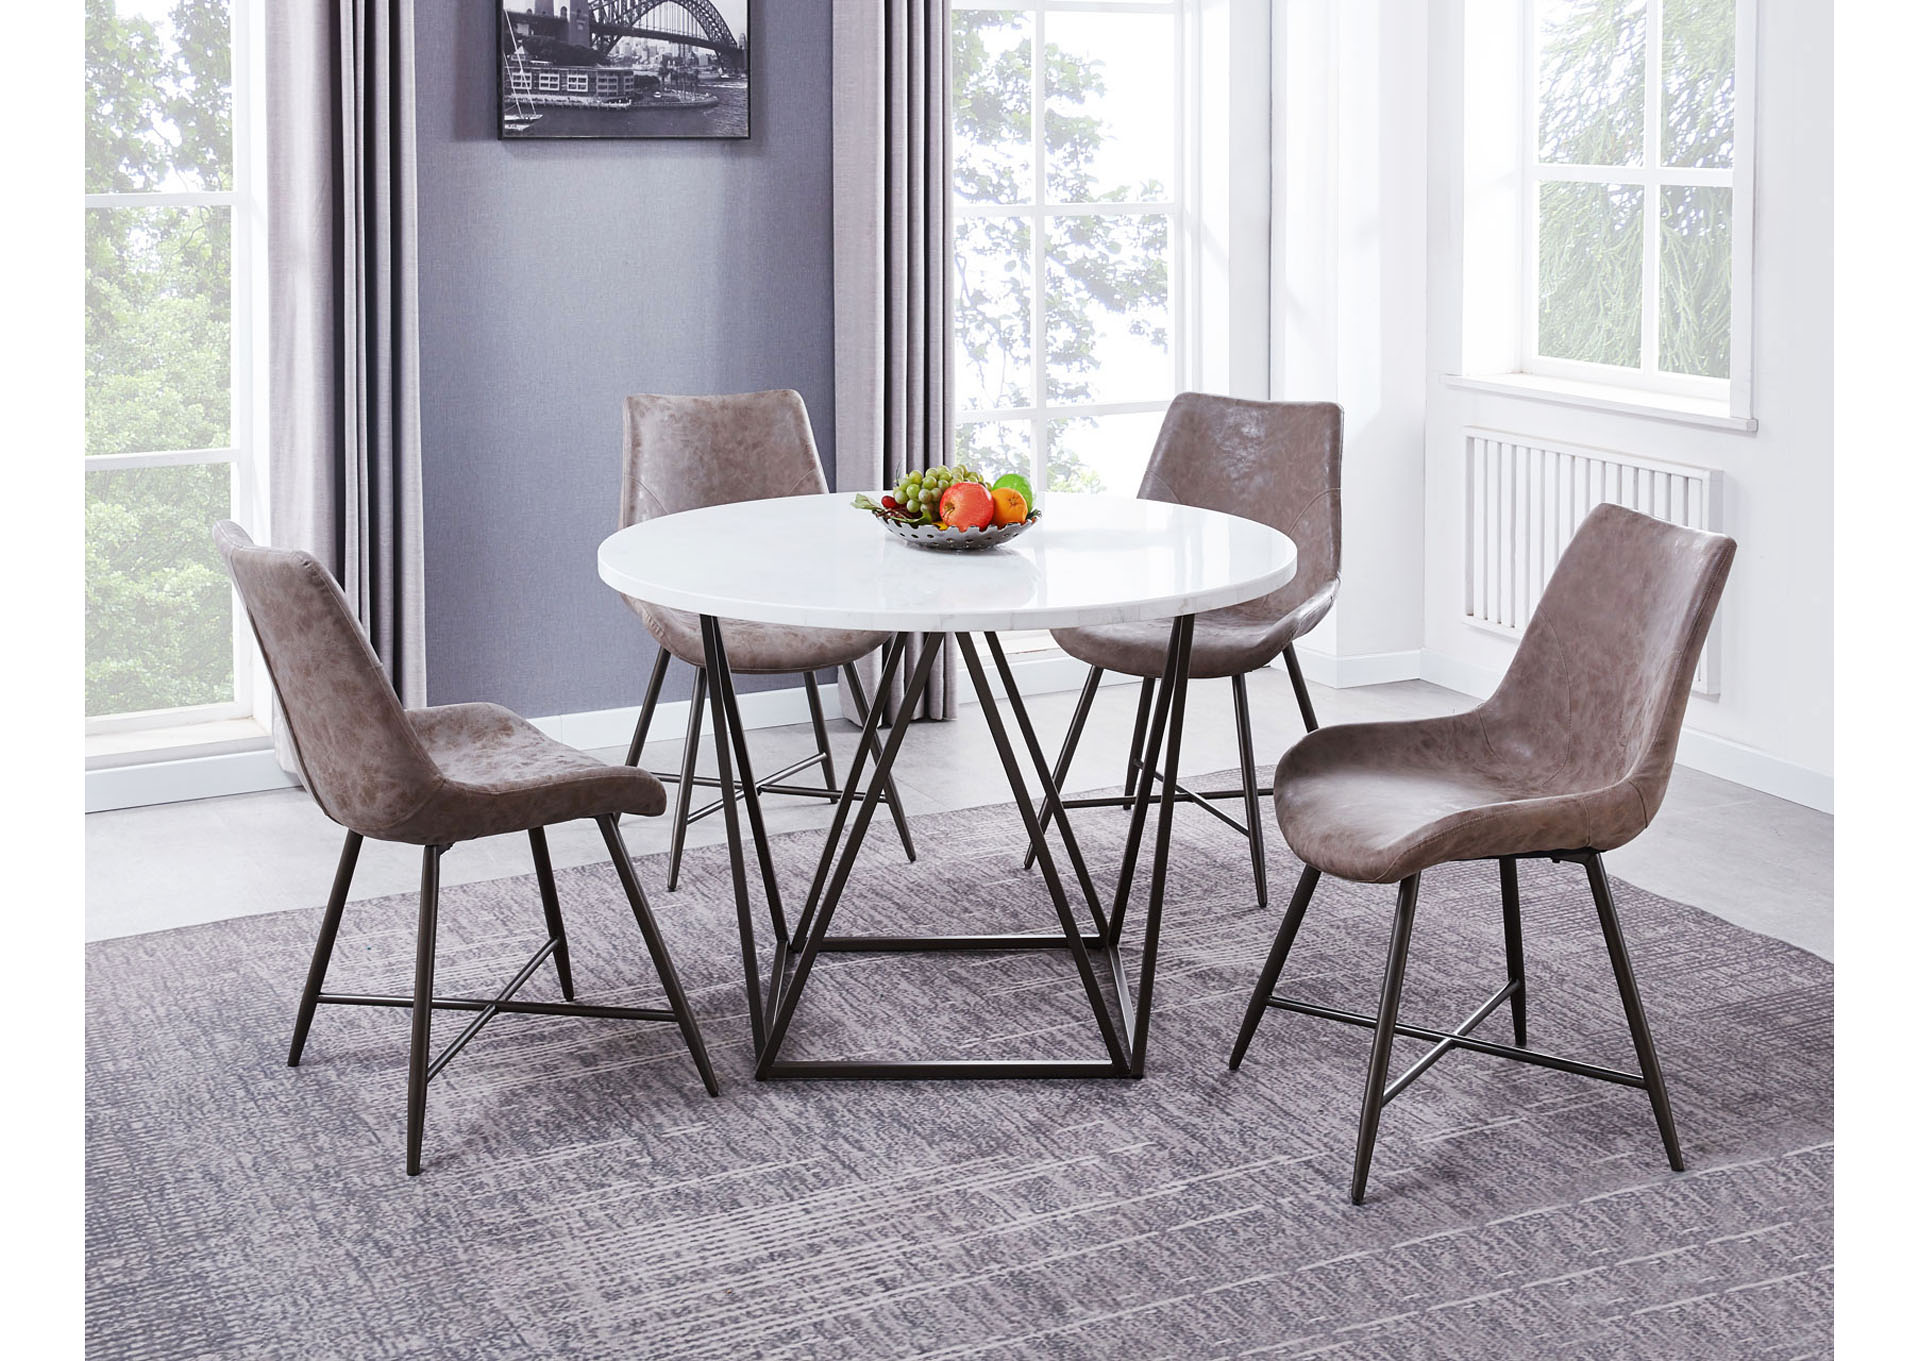 Ramona White Round Marble Top Dining Set W 4 Chairs Ivan Smith